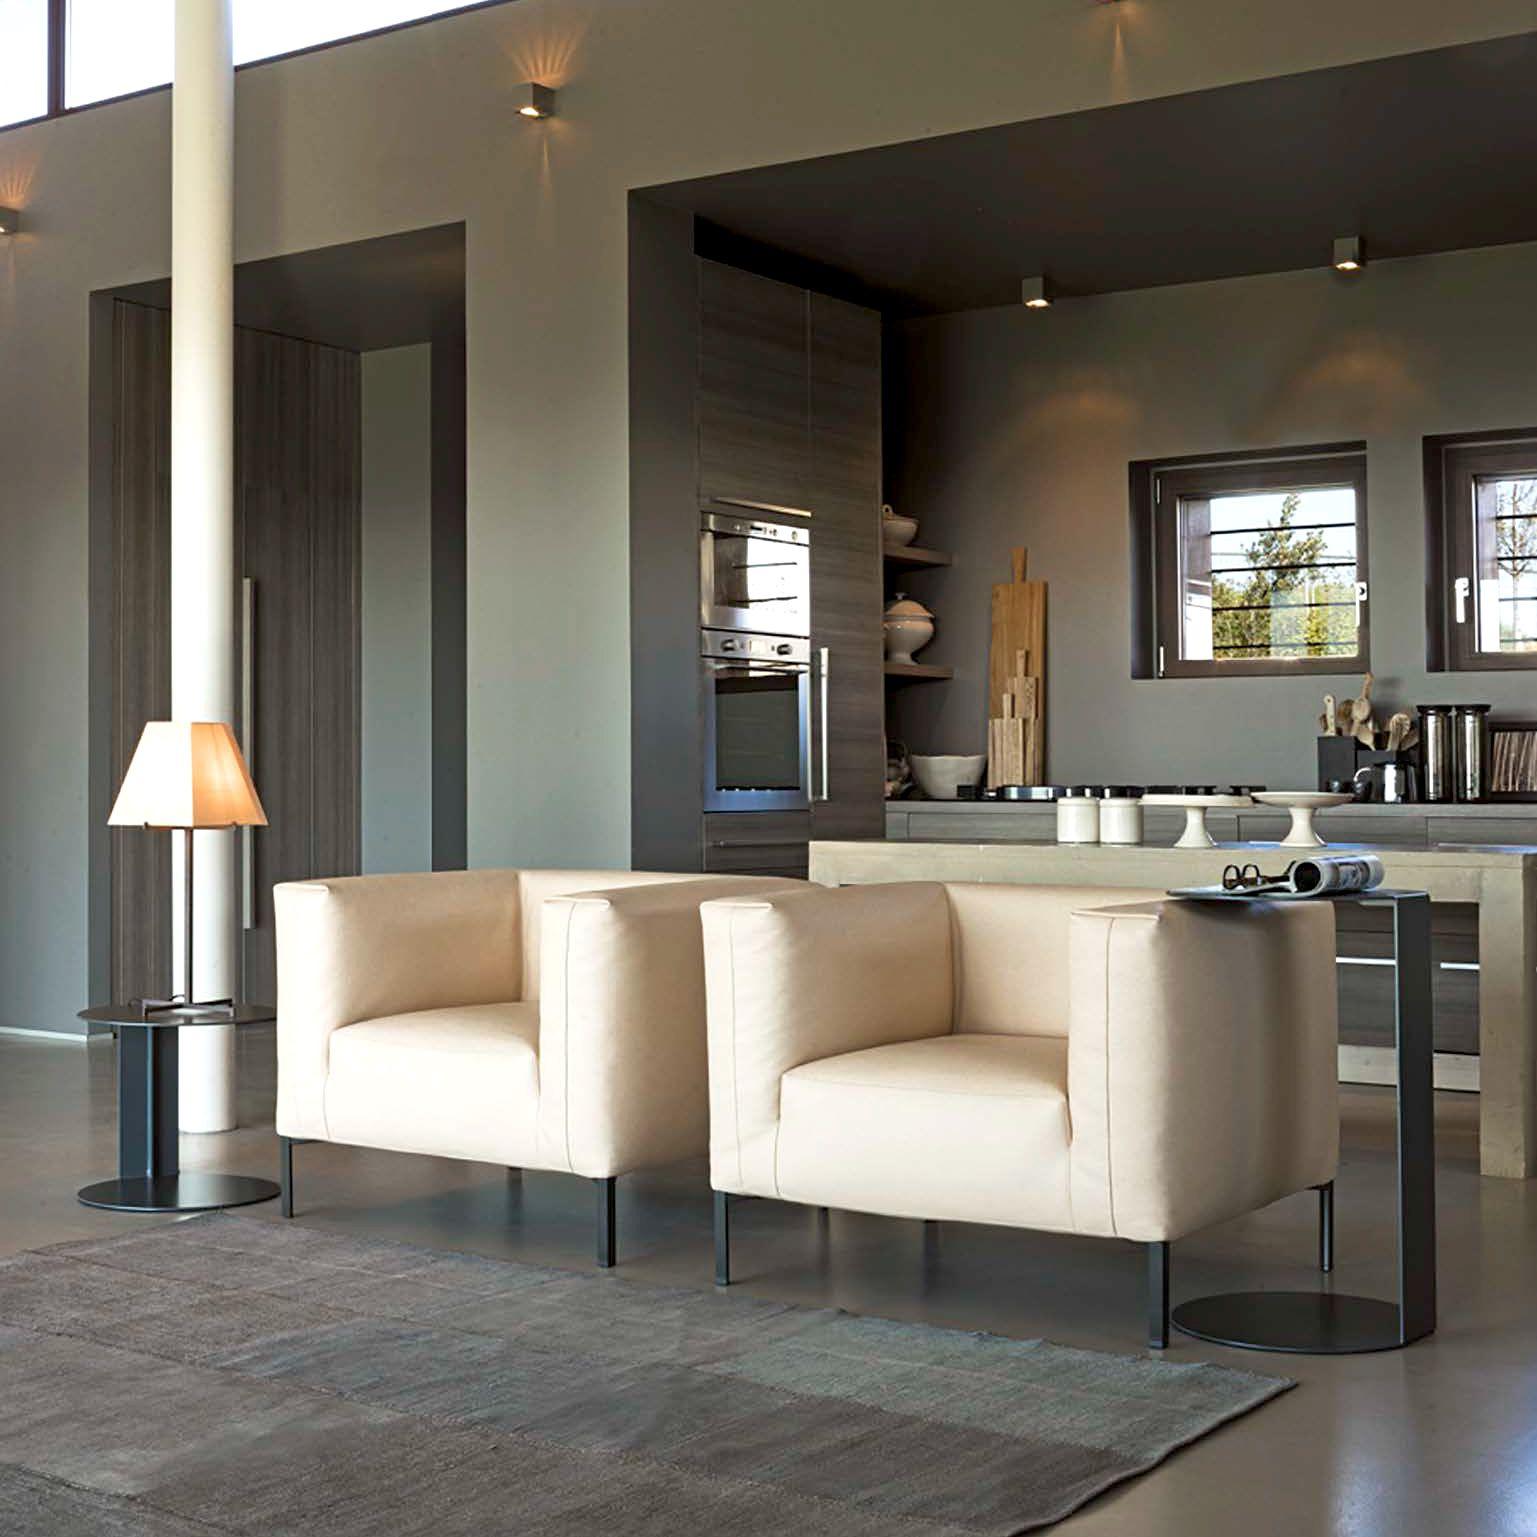 Join Lounge Chair Modern Living Room Design At Cassoni Living  # Muebles Sedutti